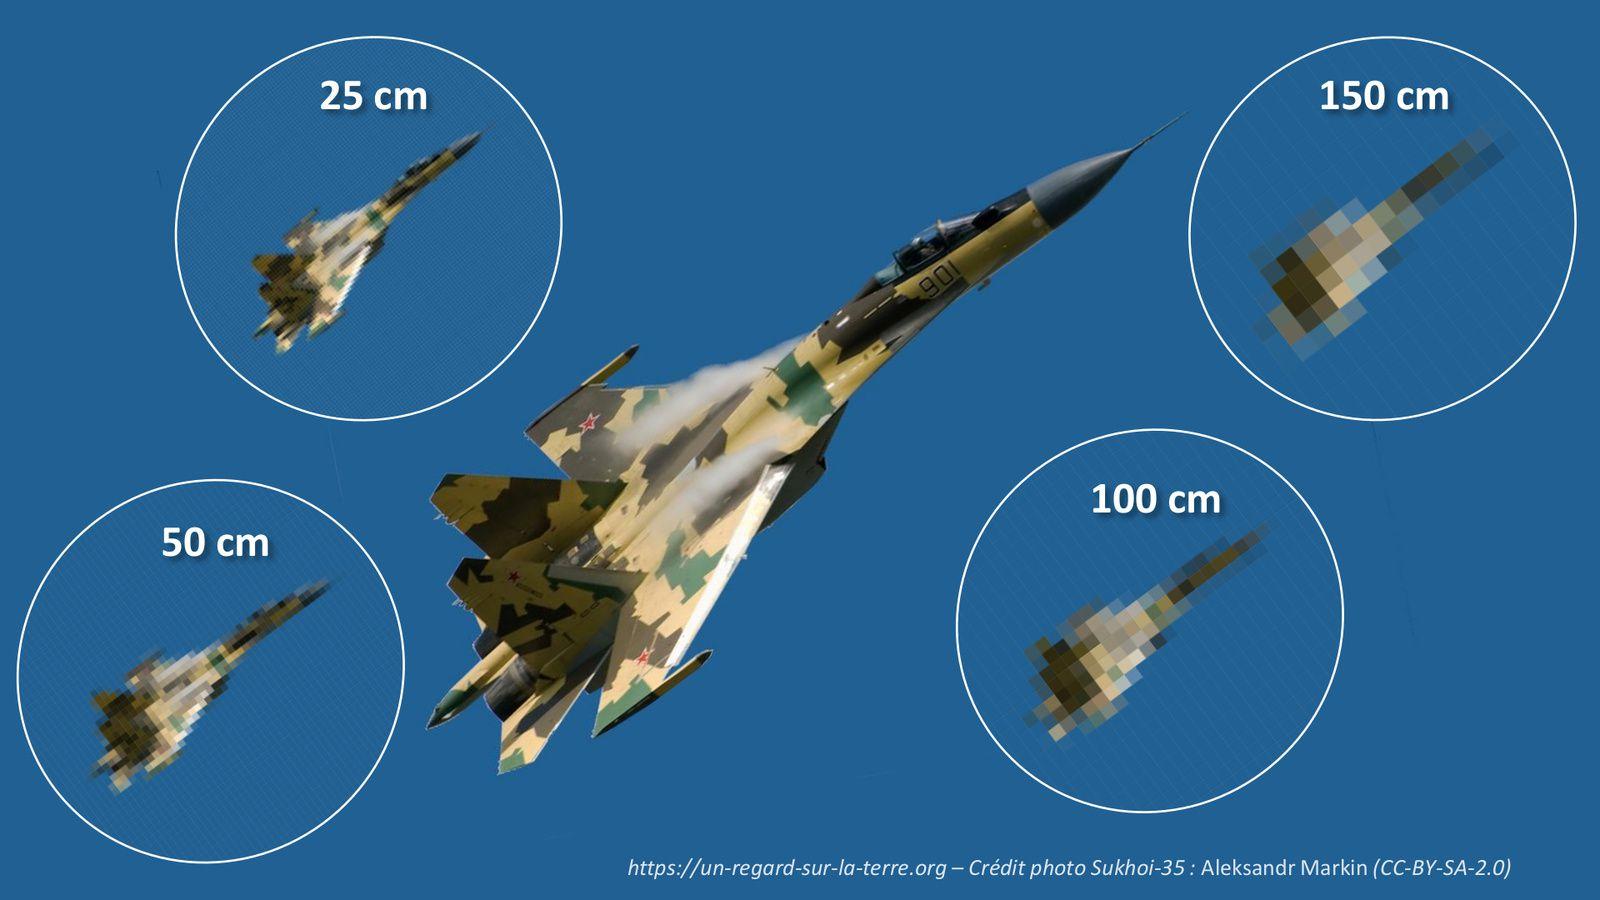 Pléiades Neo - 30 cm - GSD - resolution - résolution - Ground Sample Distance - IMINT - GEOINT - NIIRS - Intelligence - Renseignement - Satellite espion